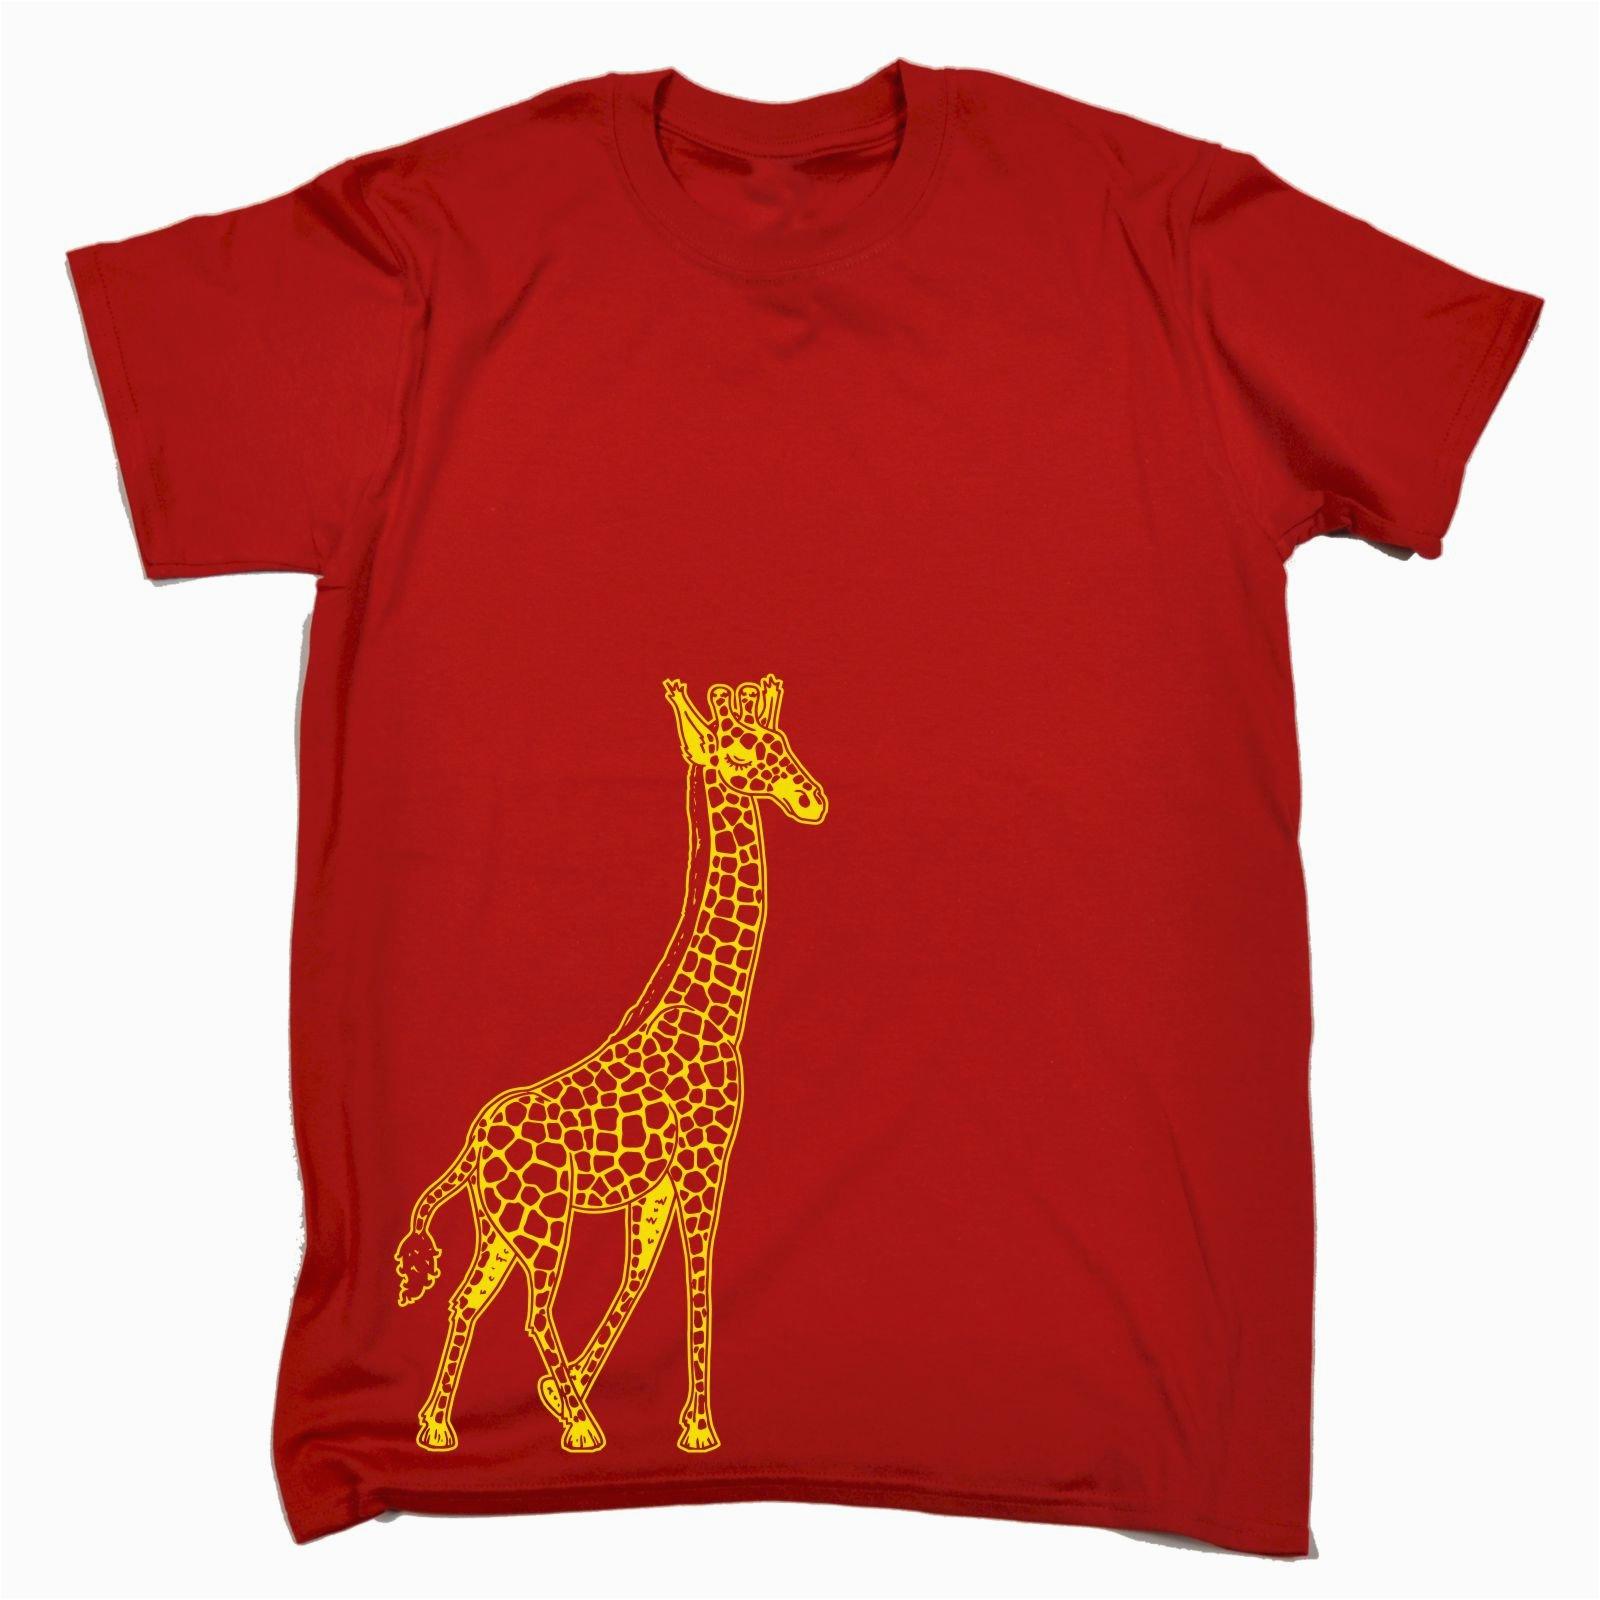 Birthday Present for Him south Africa Giraffe T Shirt Tee Design Africa Animal Funny Birthday